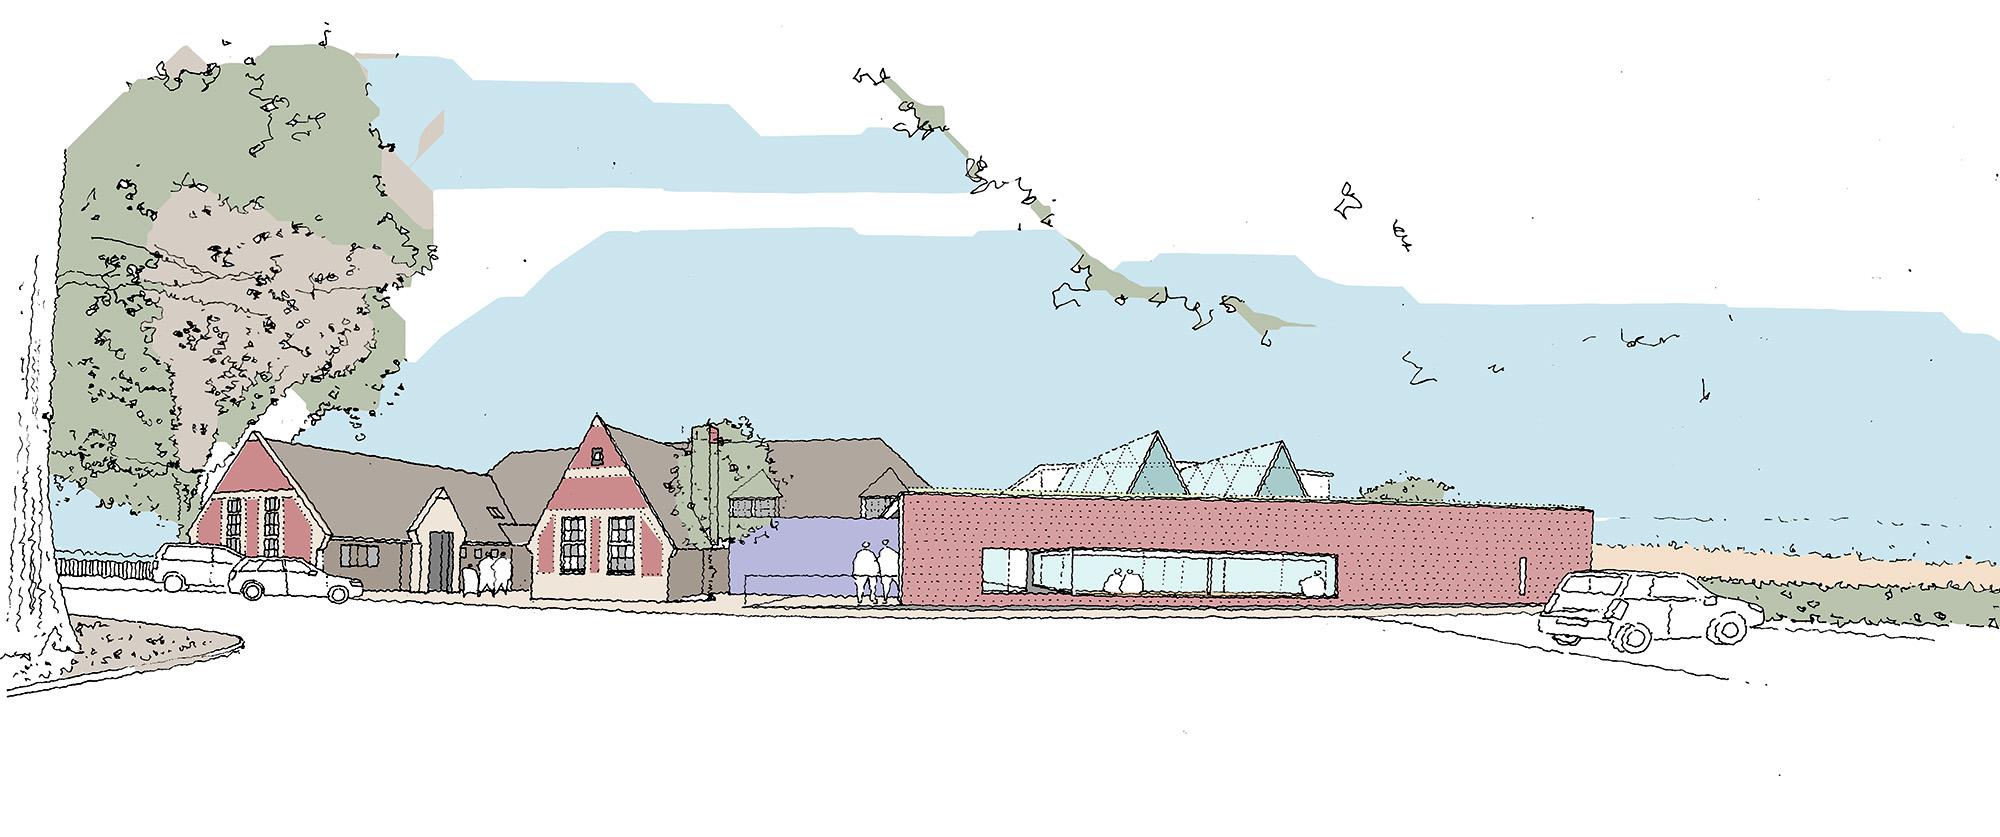 Design Engine John Keble Primary School Sketch